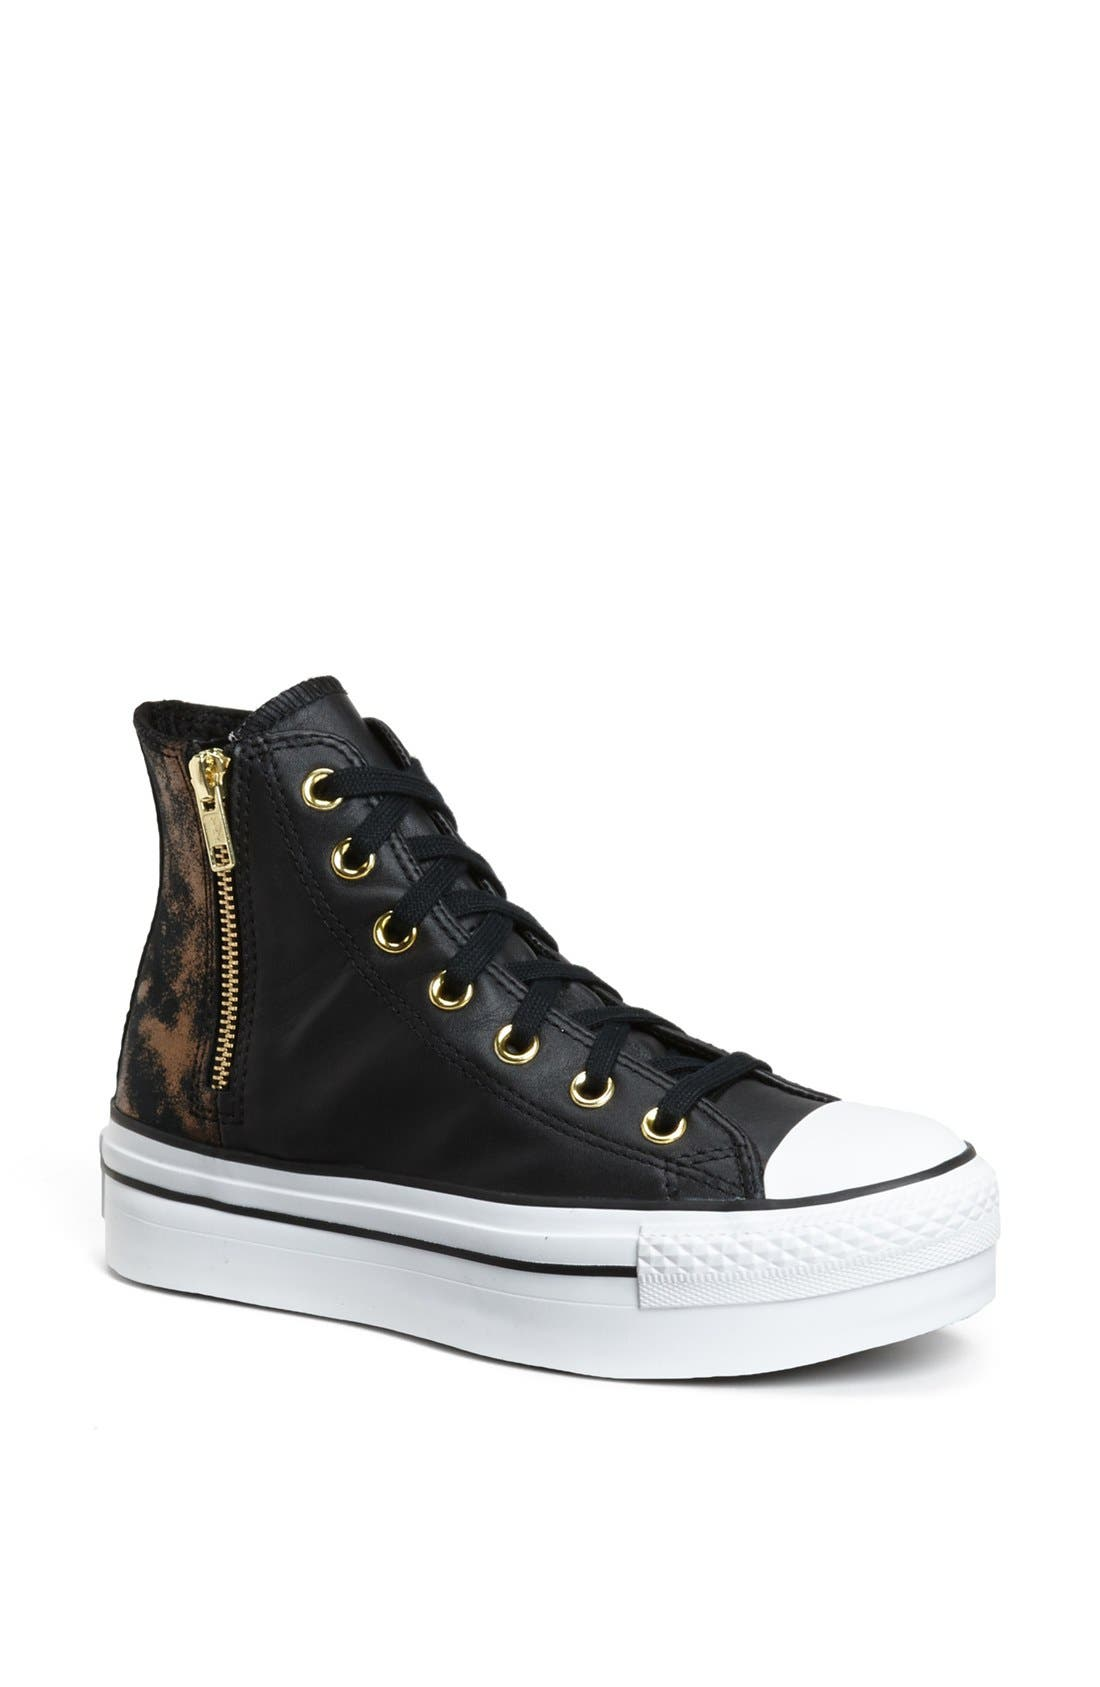 Main Image - Converse High Top Platform Sneaker (Women)